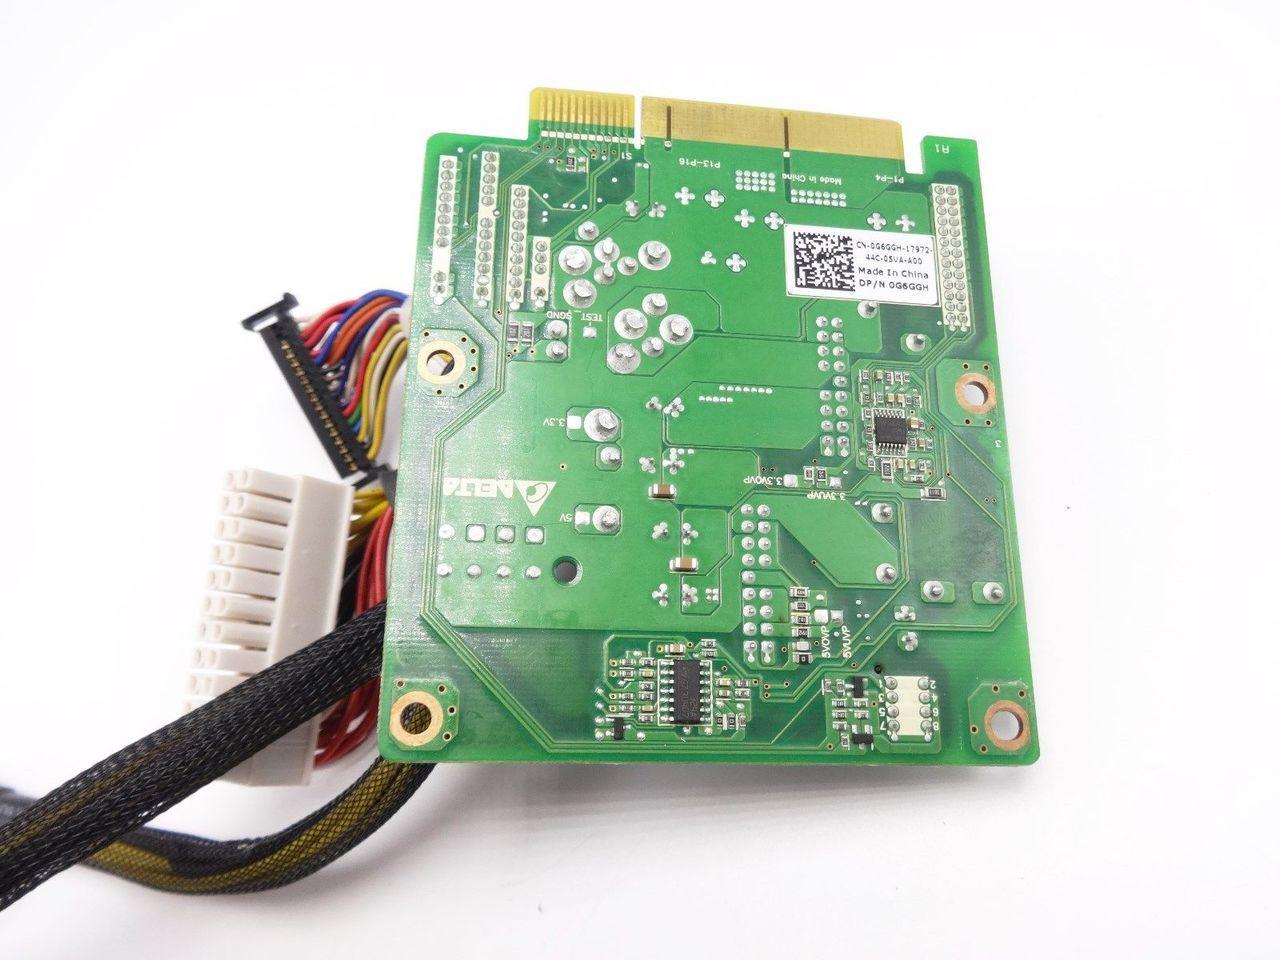 DELL G6GGH poweredge R520 power distribution board